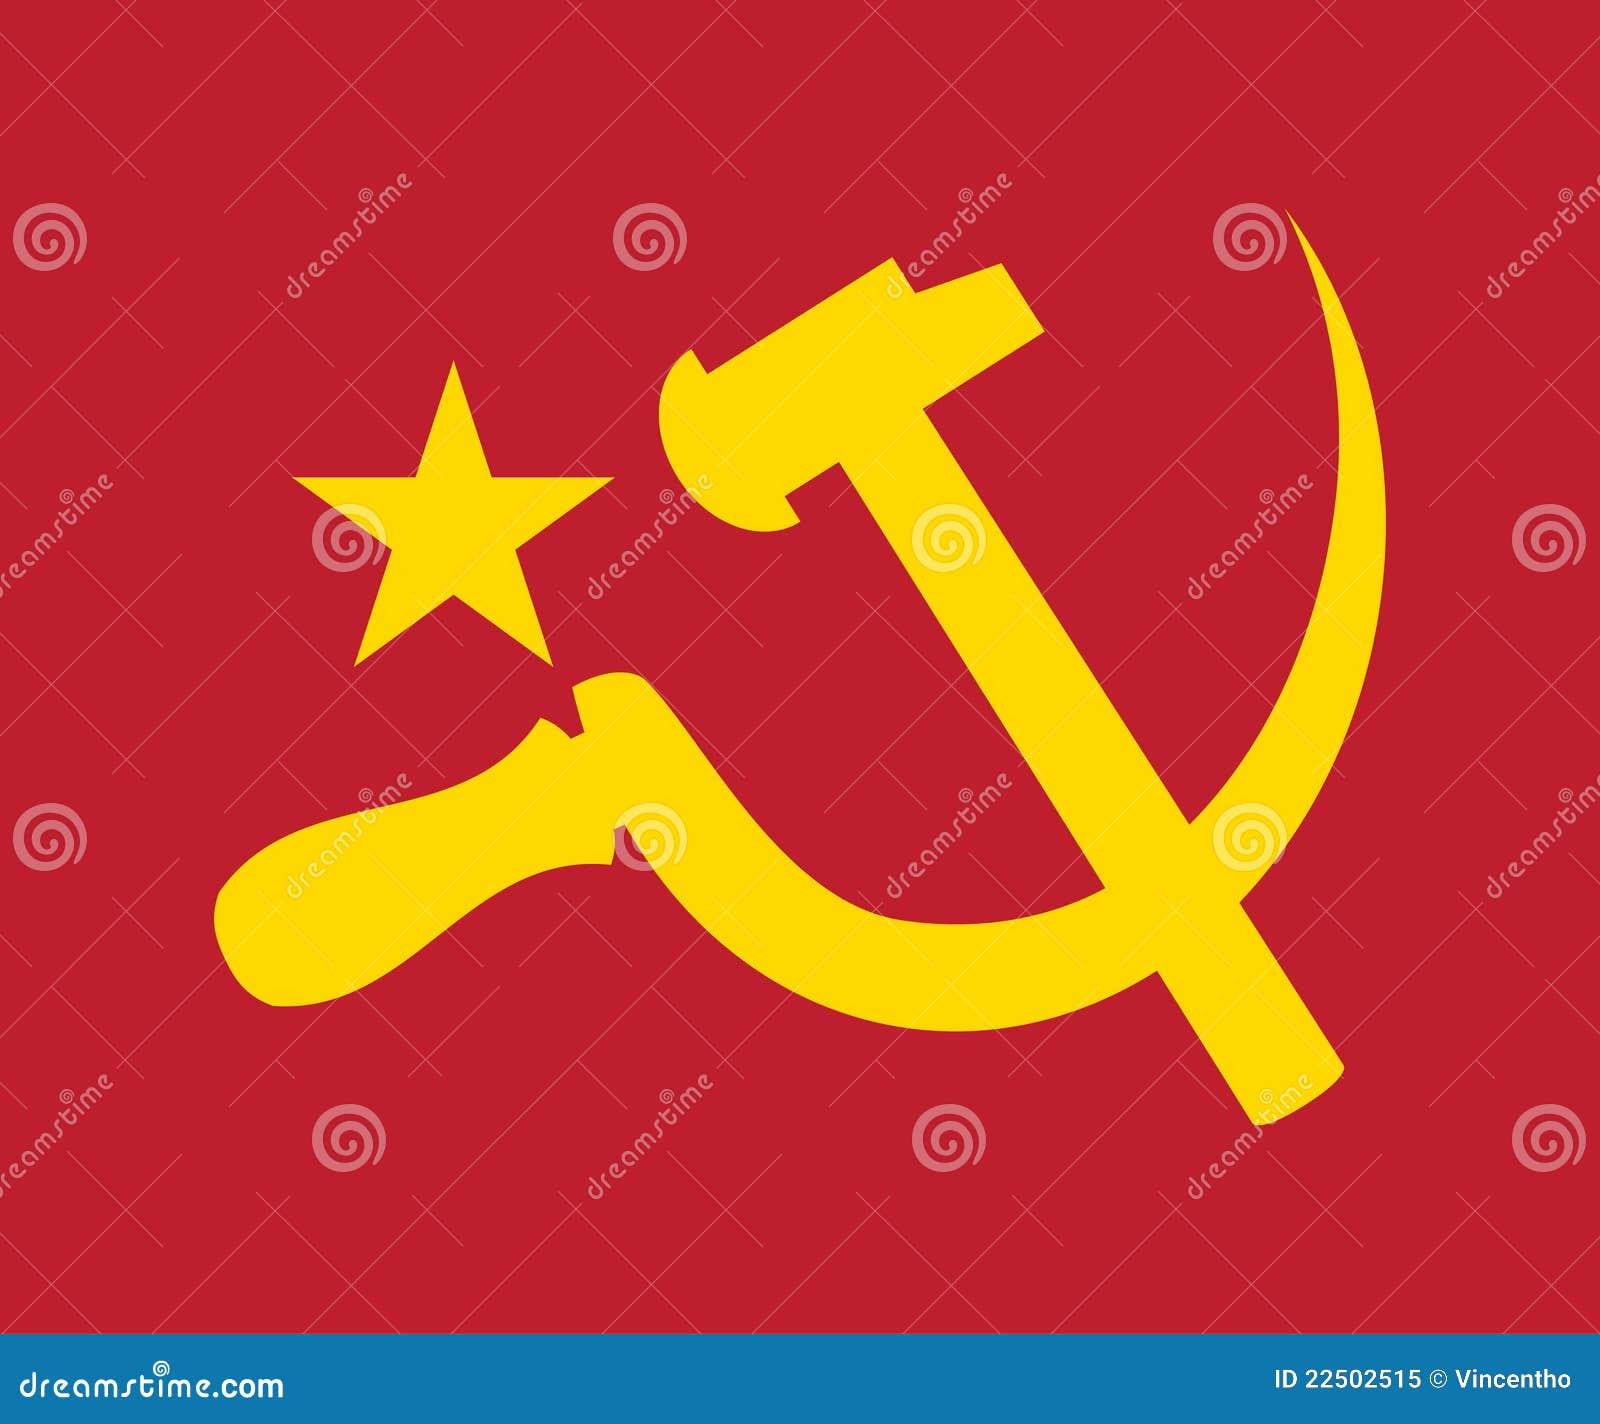 Communist Symbol Star The symbol of Communism-